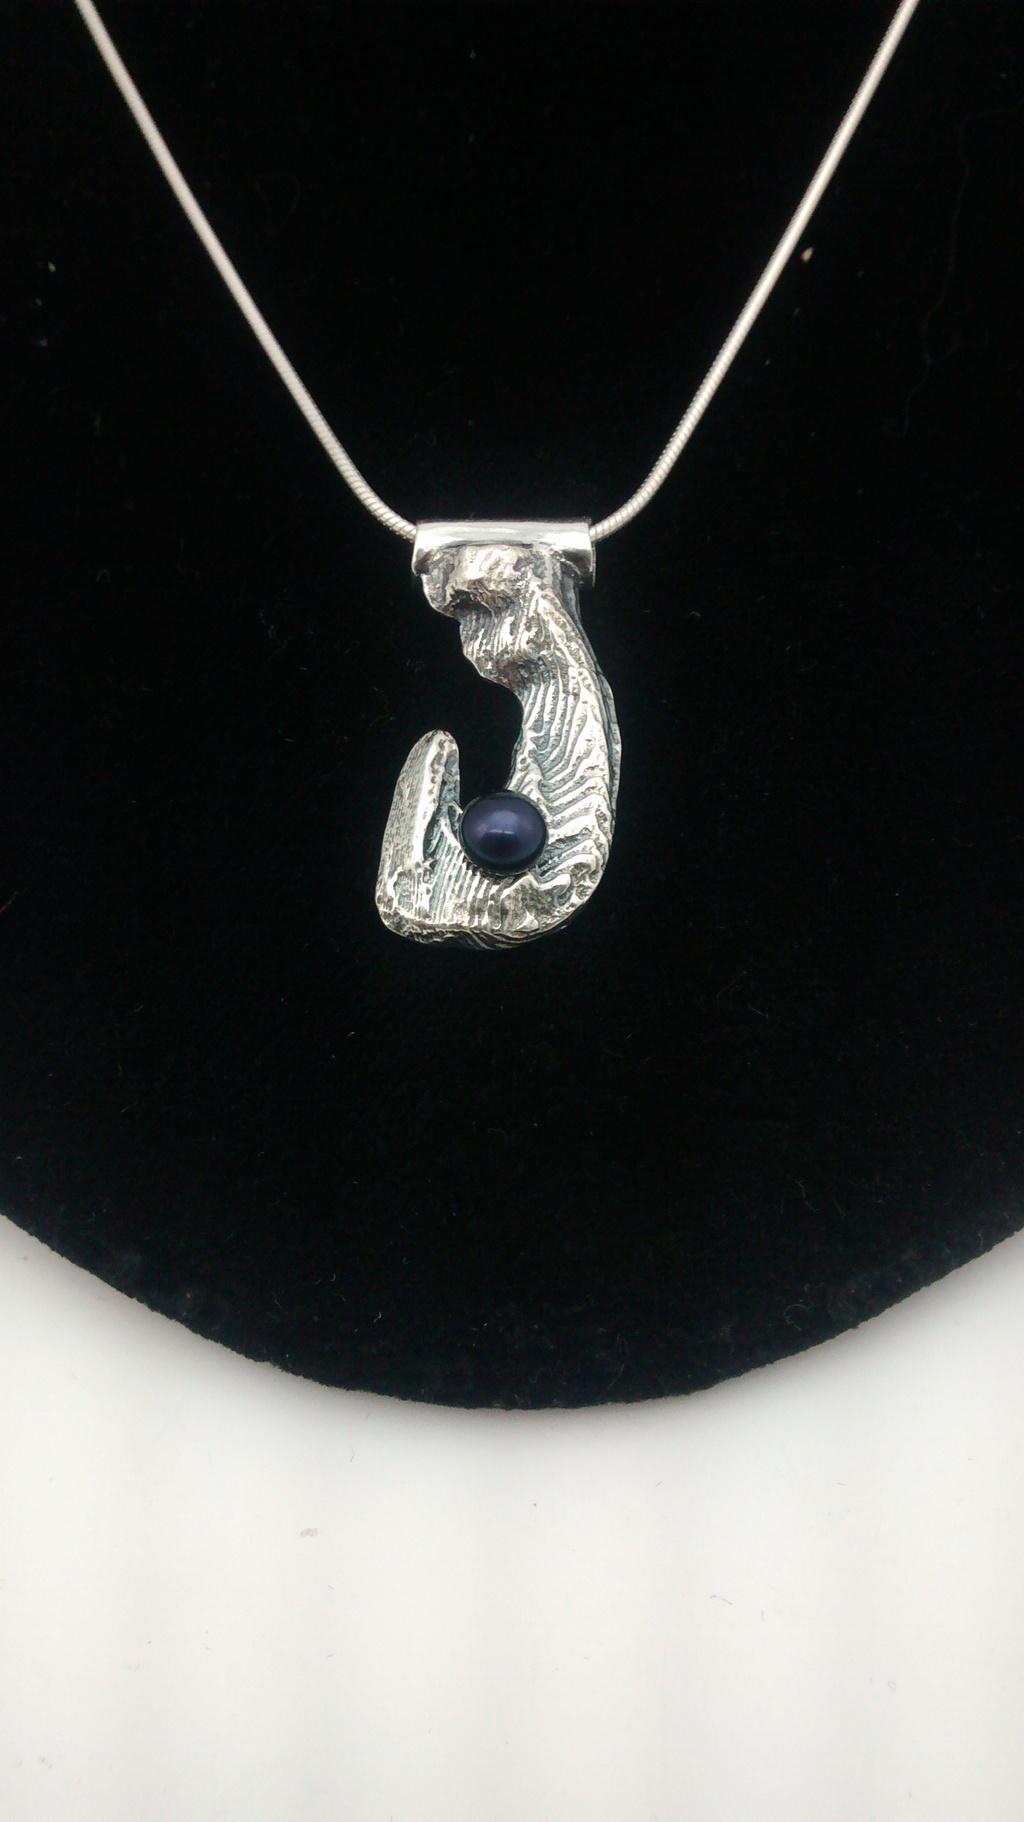 Most recent image: cuttlefish pendant